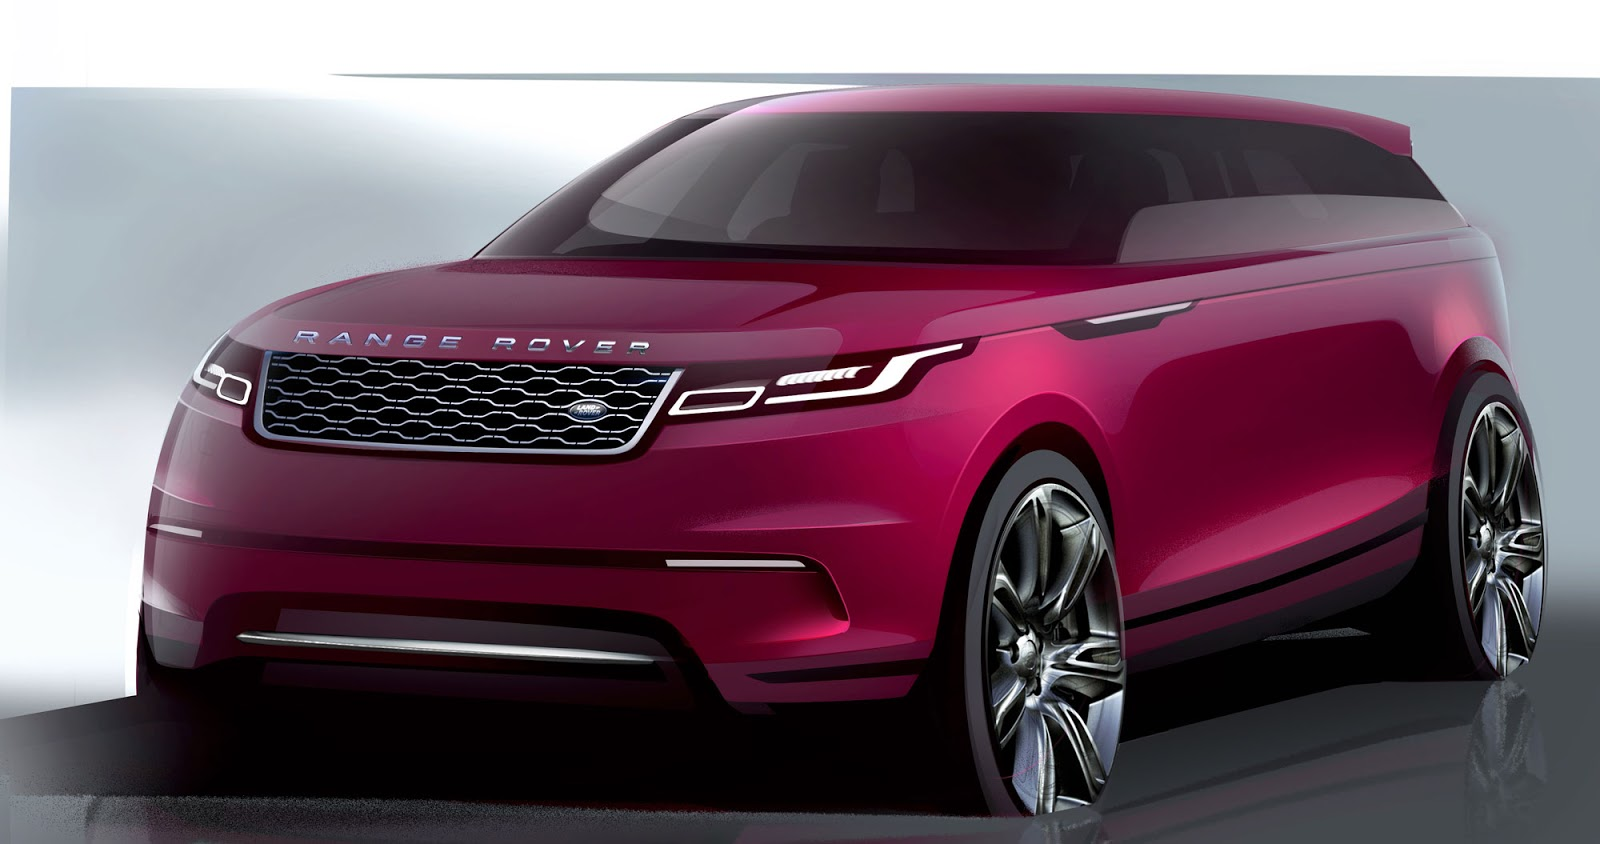 Range Rover Velar sketch front quarter view in fuscia